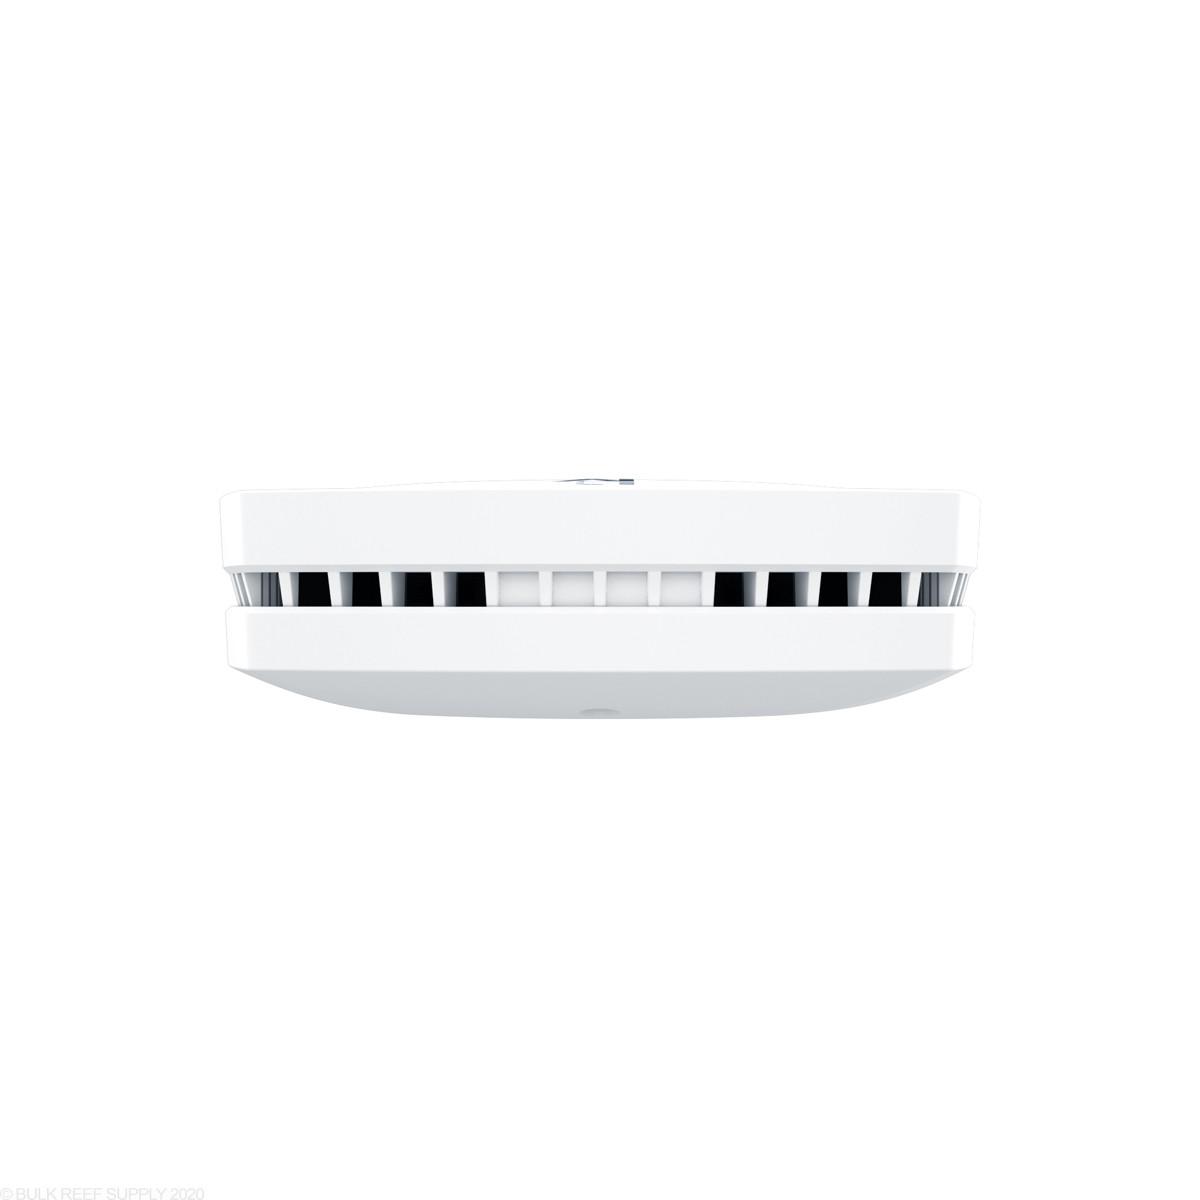 Prime HD Freshwater LED Module - White (OPEN BOX) - Aqua ...